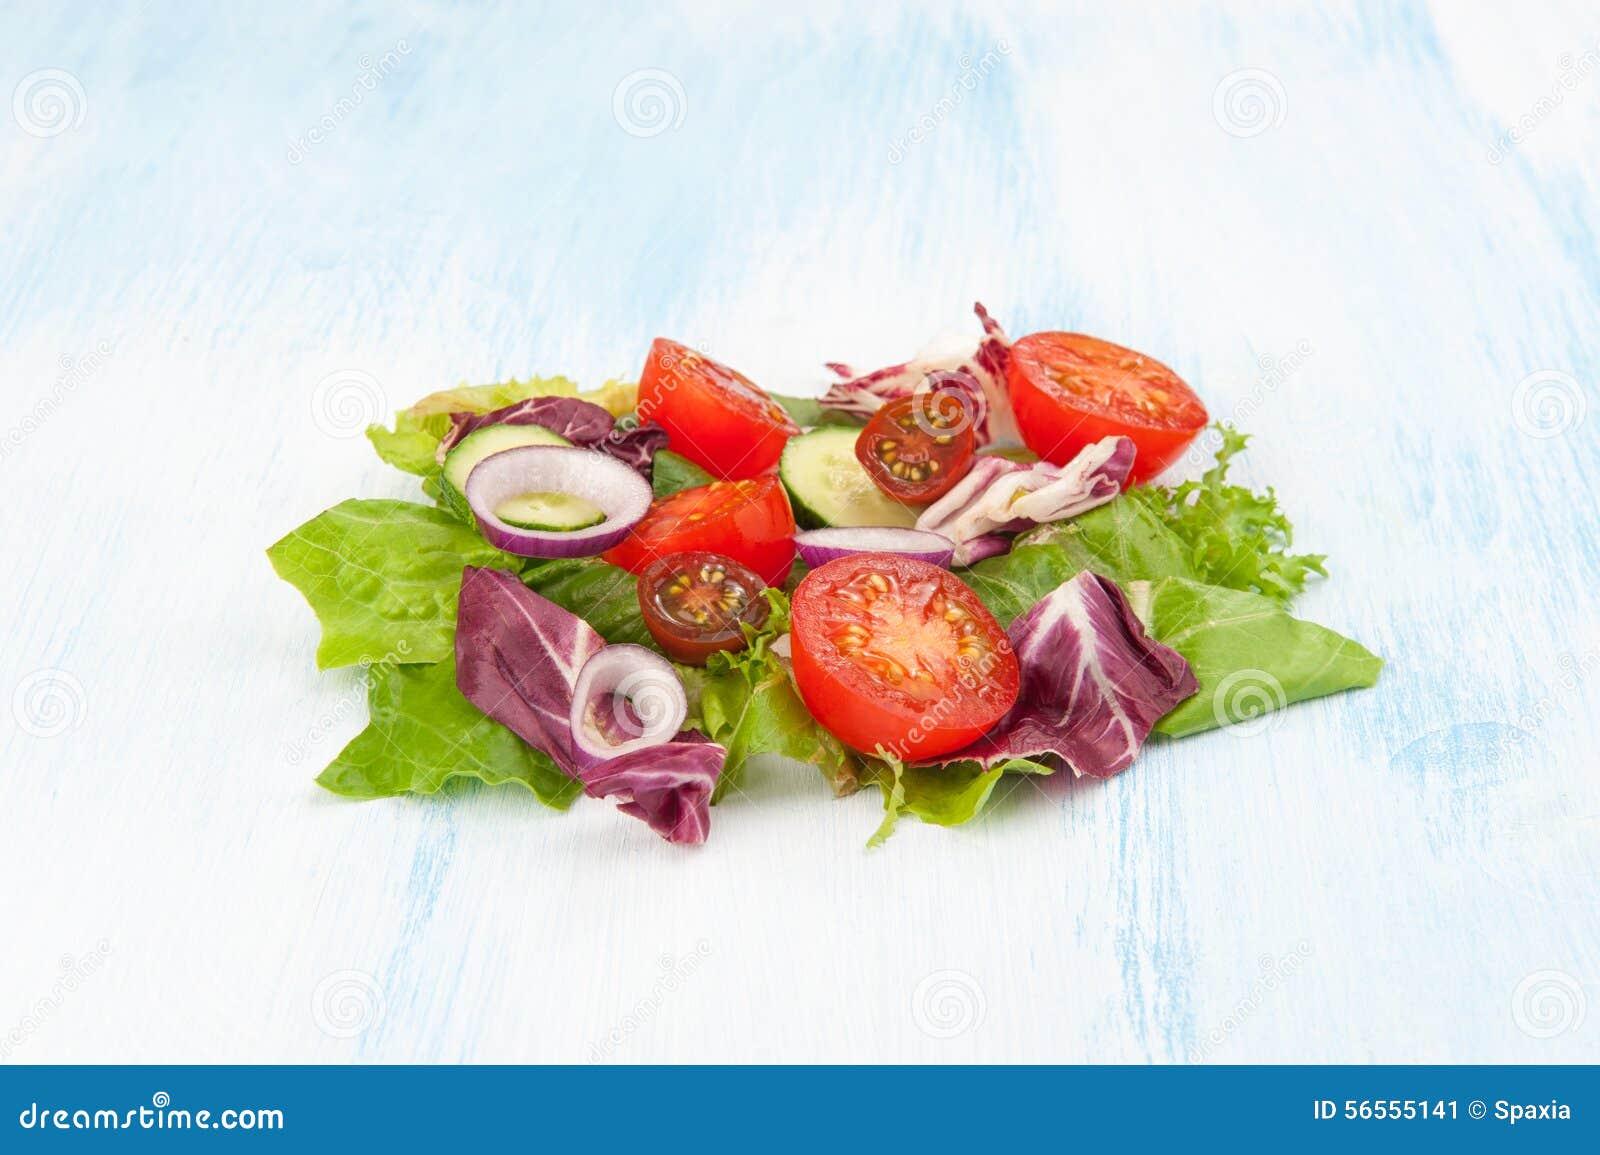 Download φρέσκο λαχανικό ντοματών σαλάτας μιγμάτων μαρουλιού αγγουριών Στοκ Εικόνα - εικόνα από εύγευστος, closeup: 56555141